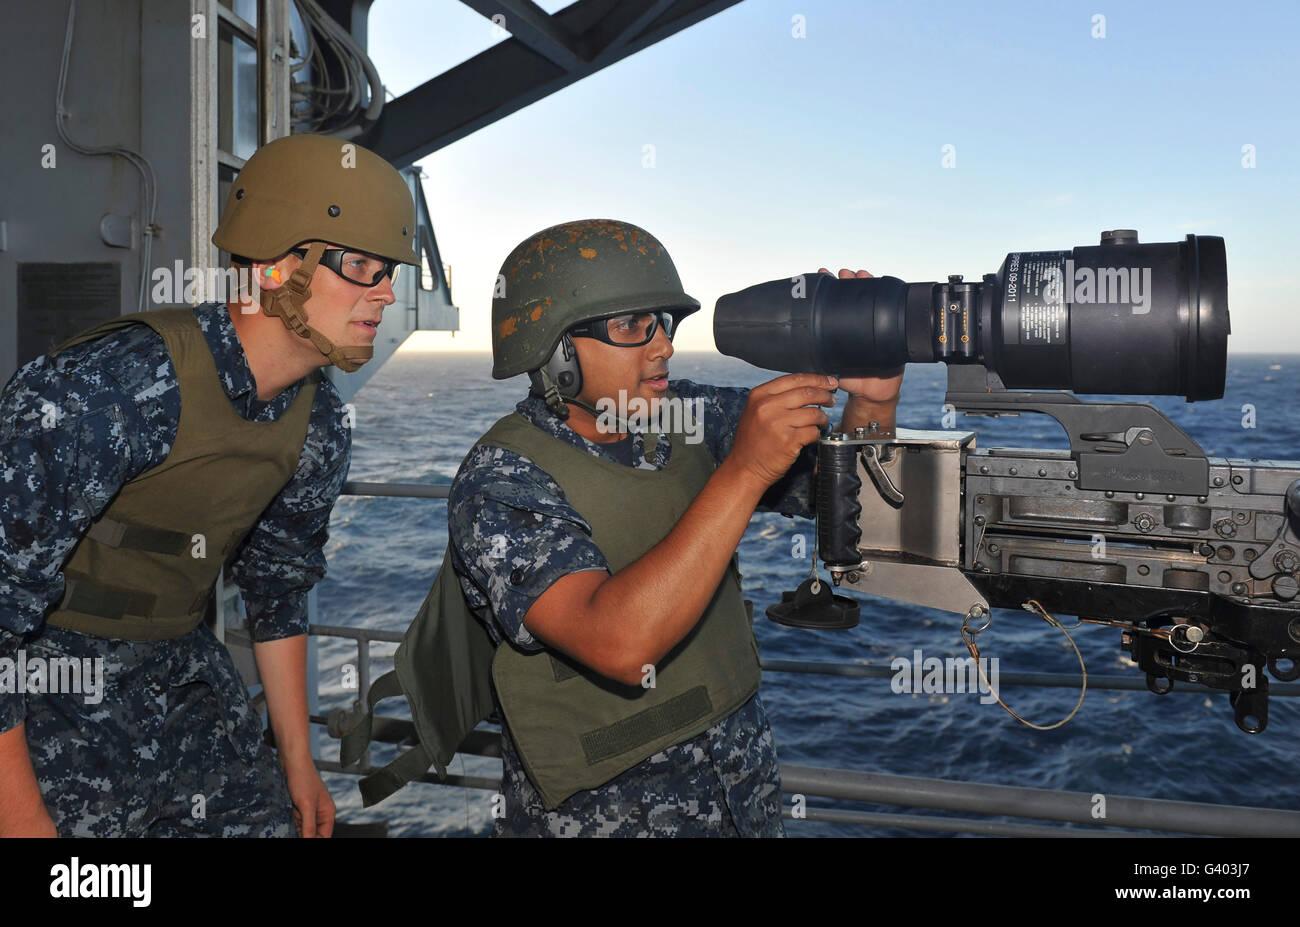 Airmen adjust a night vision scope on a .50-caliber machine gun. - Stock Image